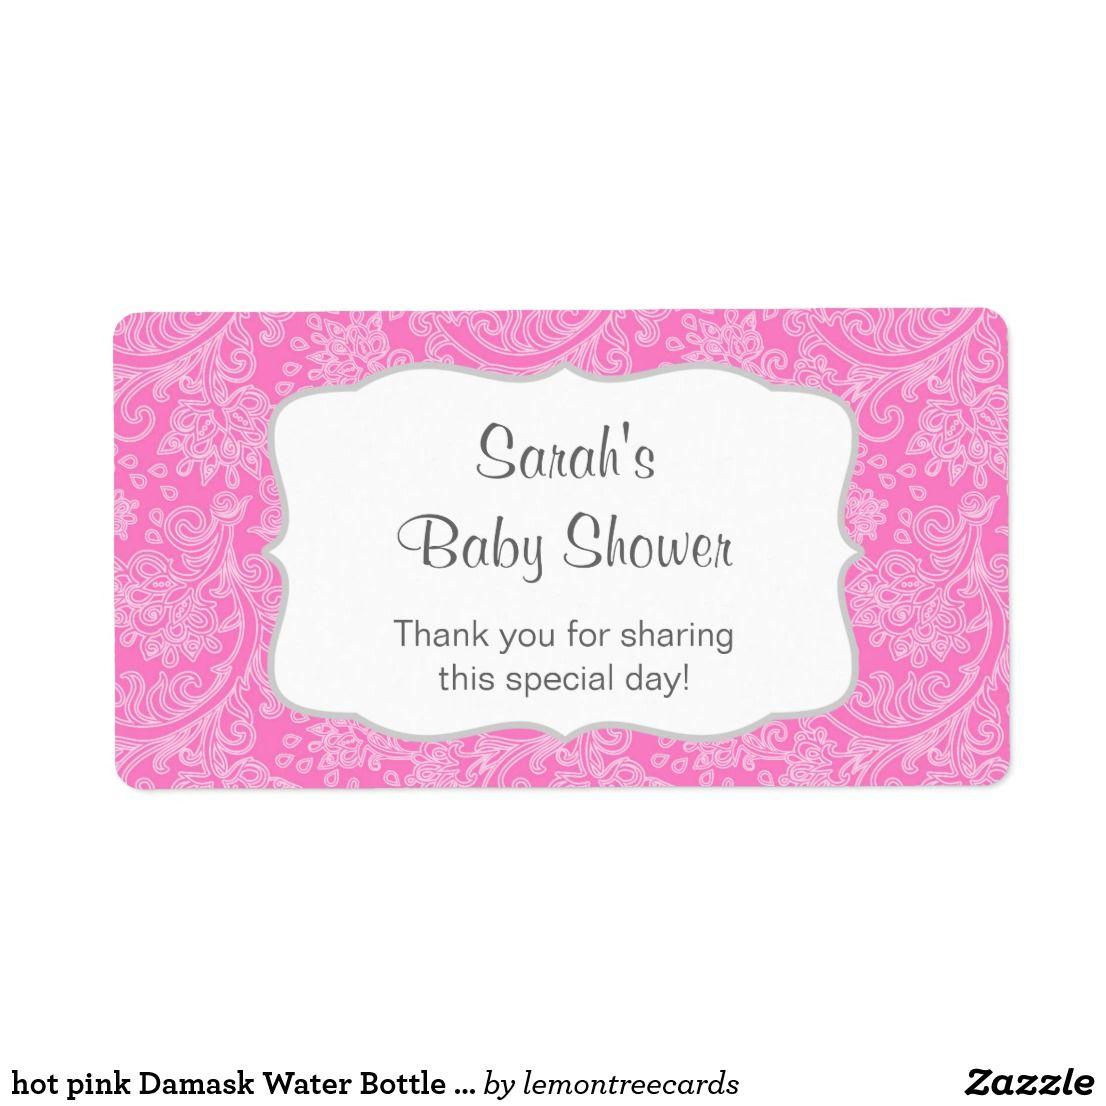 hot pink Damask Water Bottle favor u customize Label | Favors and ...